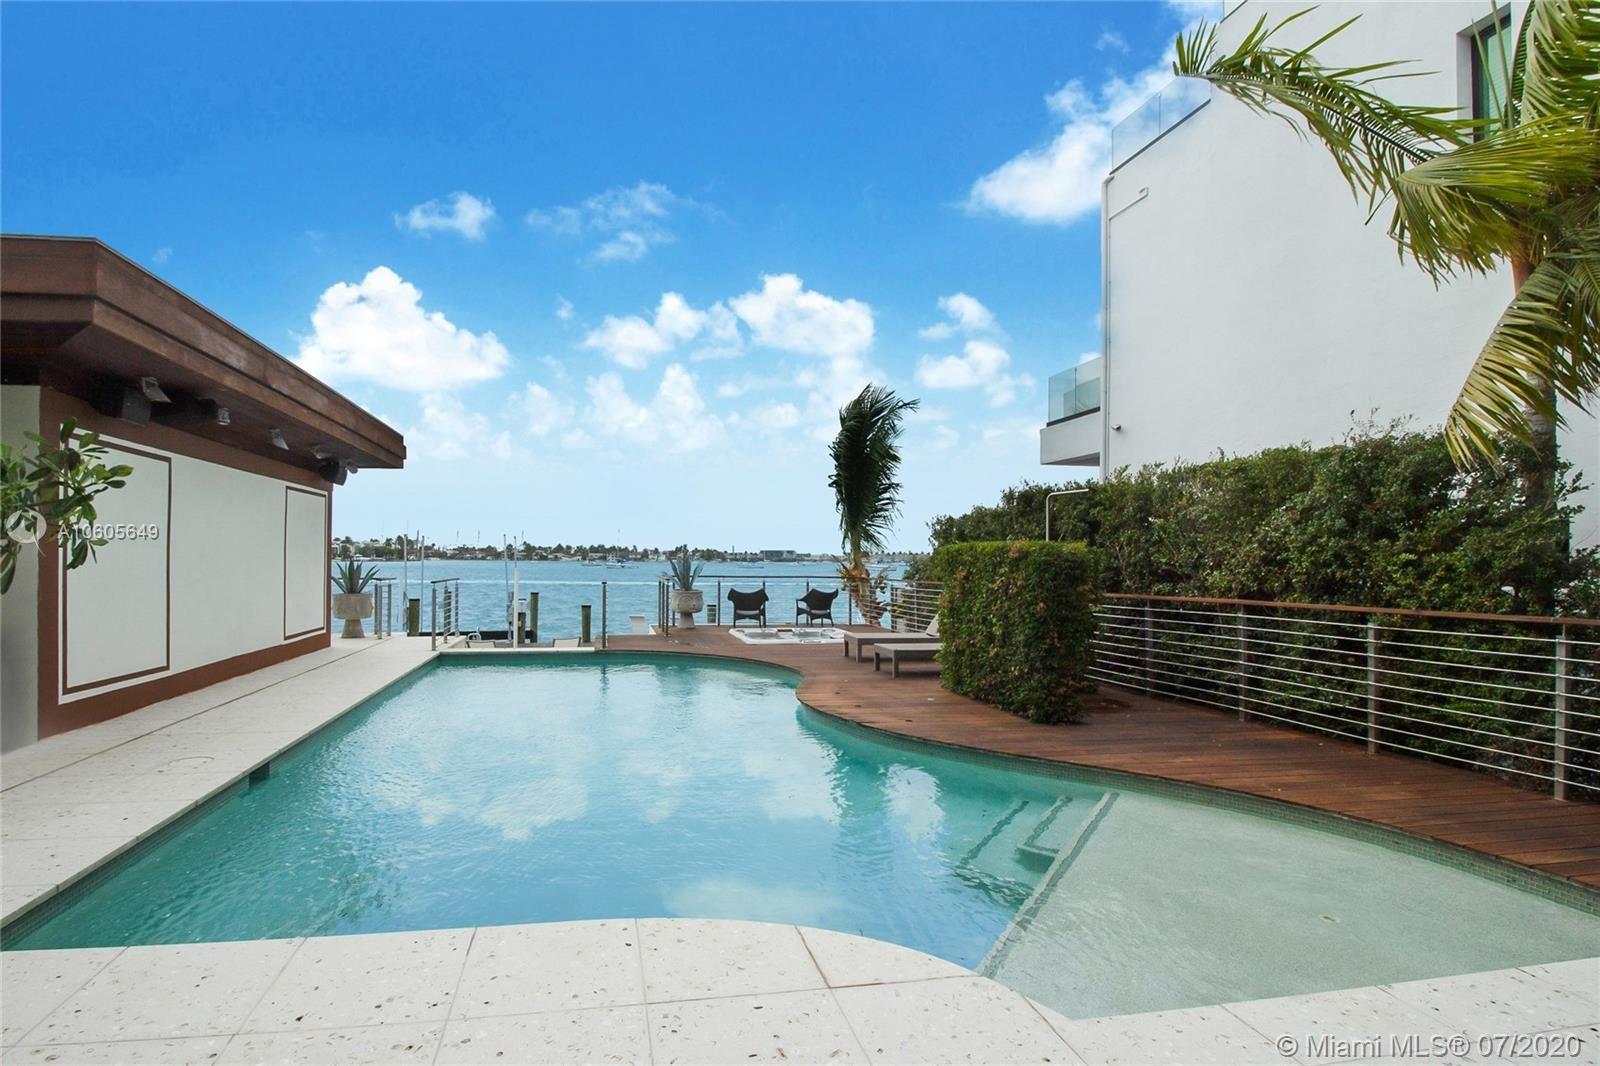 Photo 24 of Listing MLS a10605649 in 1376 S Venetian Way Miami FL 33139